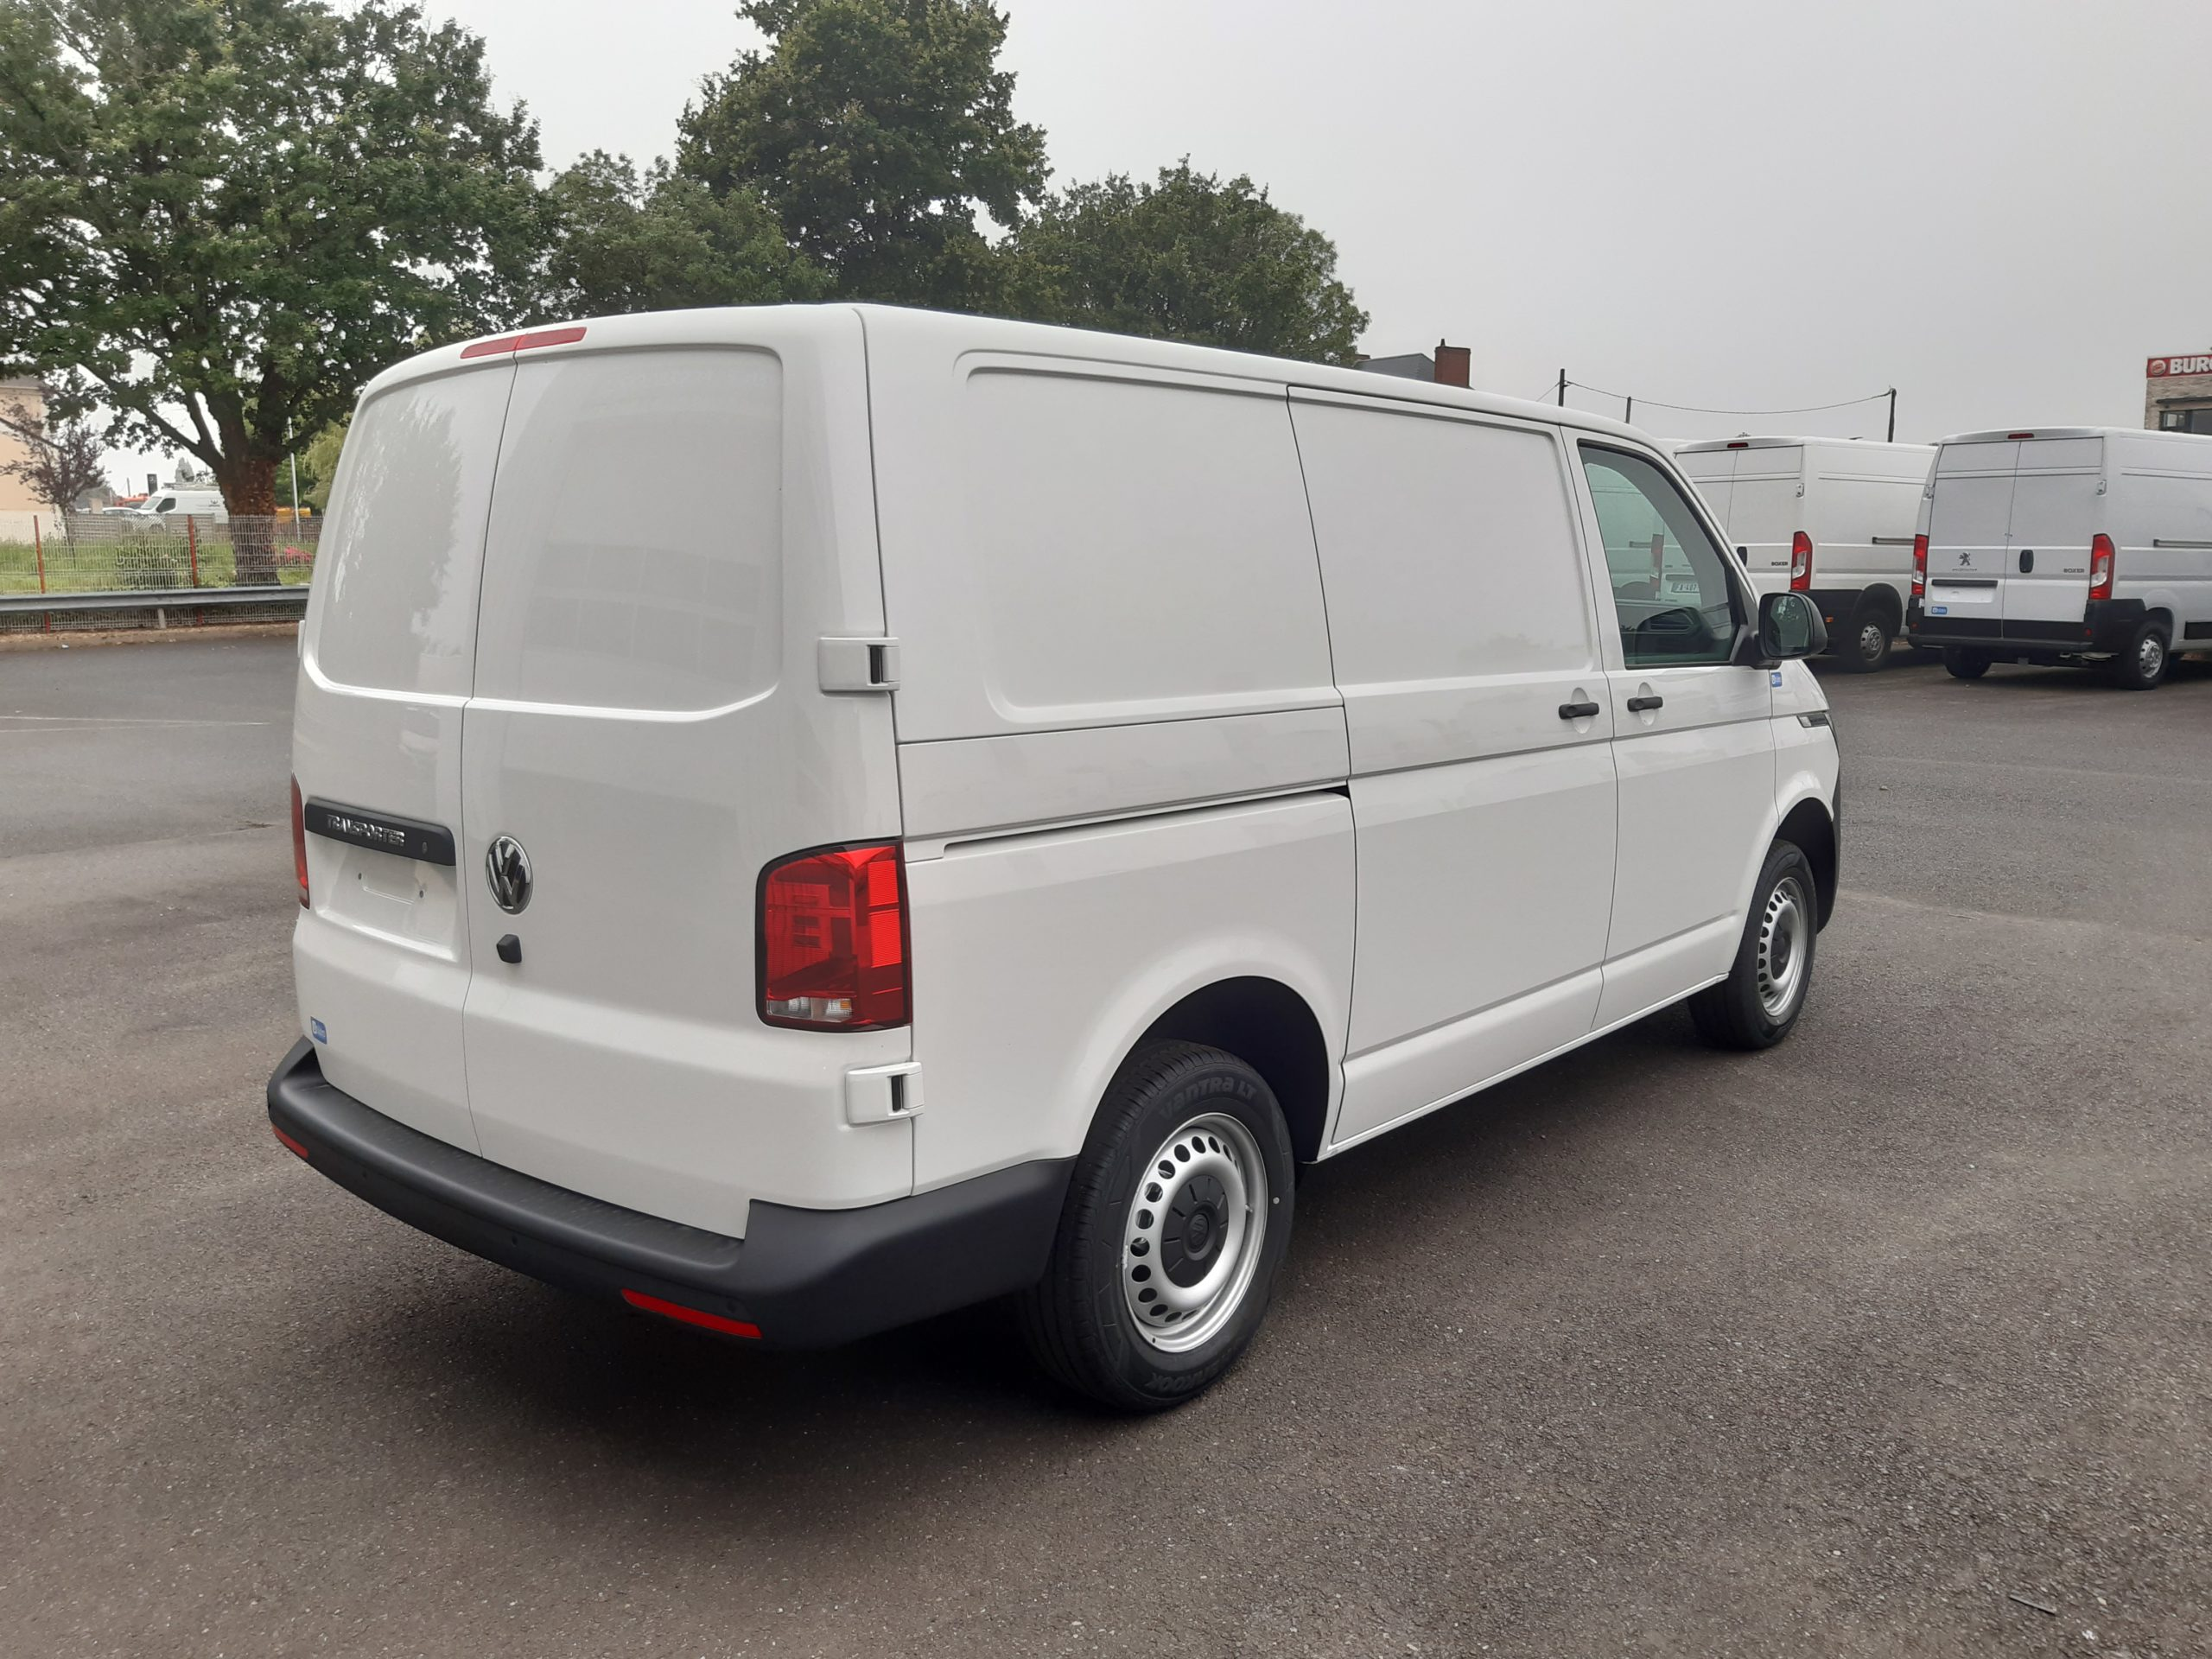 Location d'un fourgon compact double cabine - Volkswagen Transporter T6-1 - Vue4